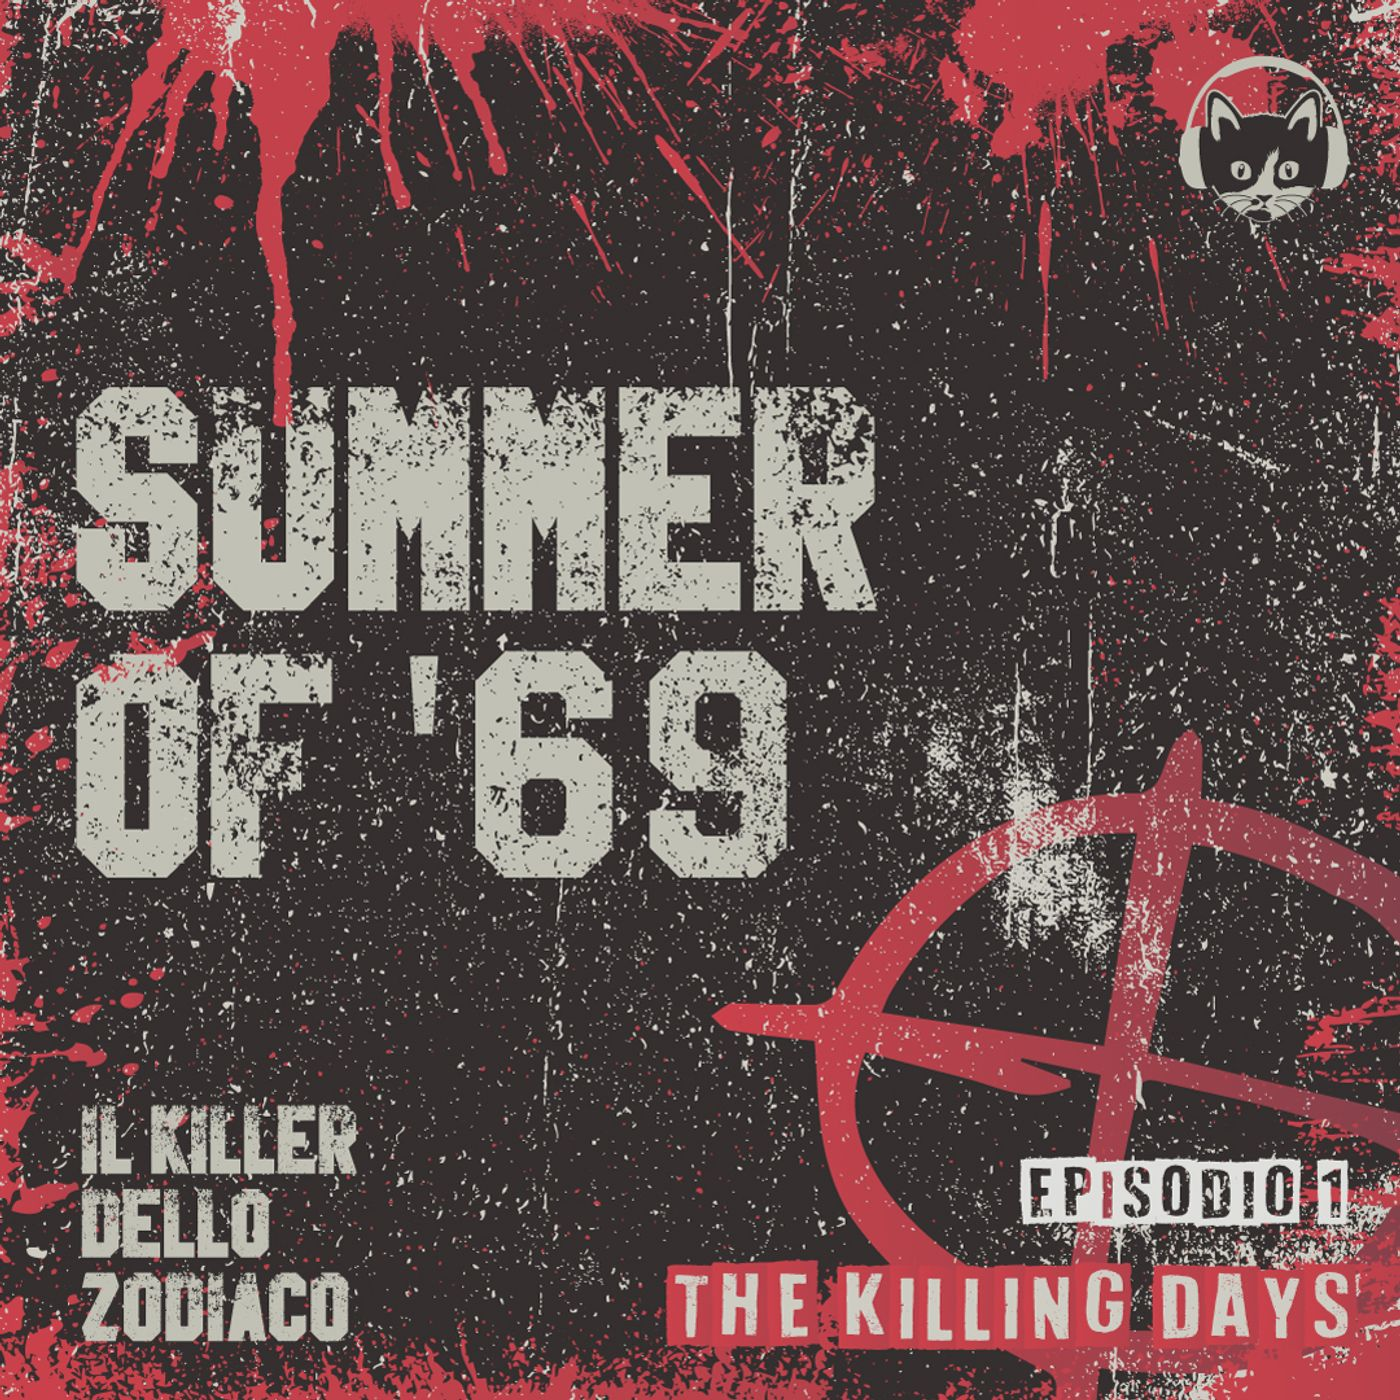 Episodio 01: Summer of '69